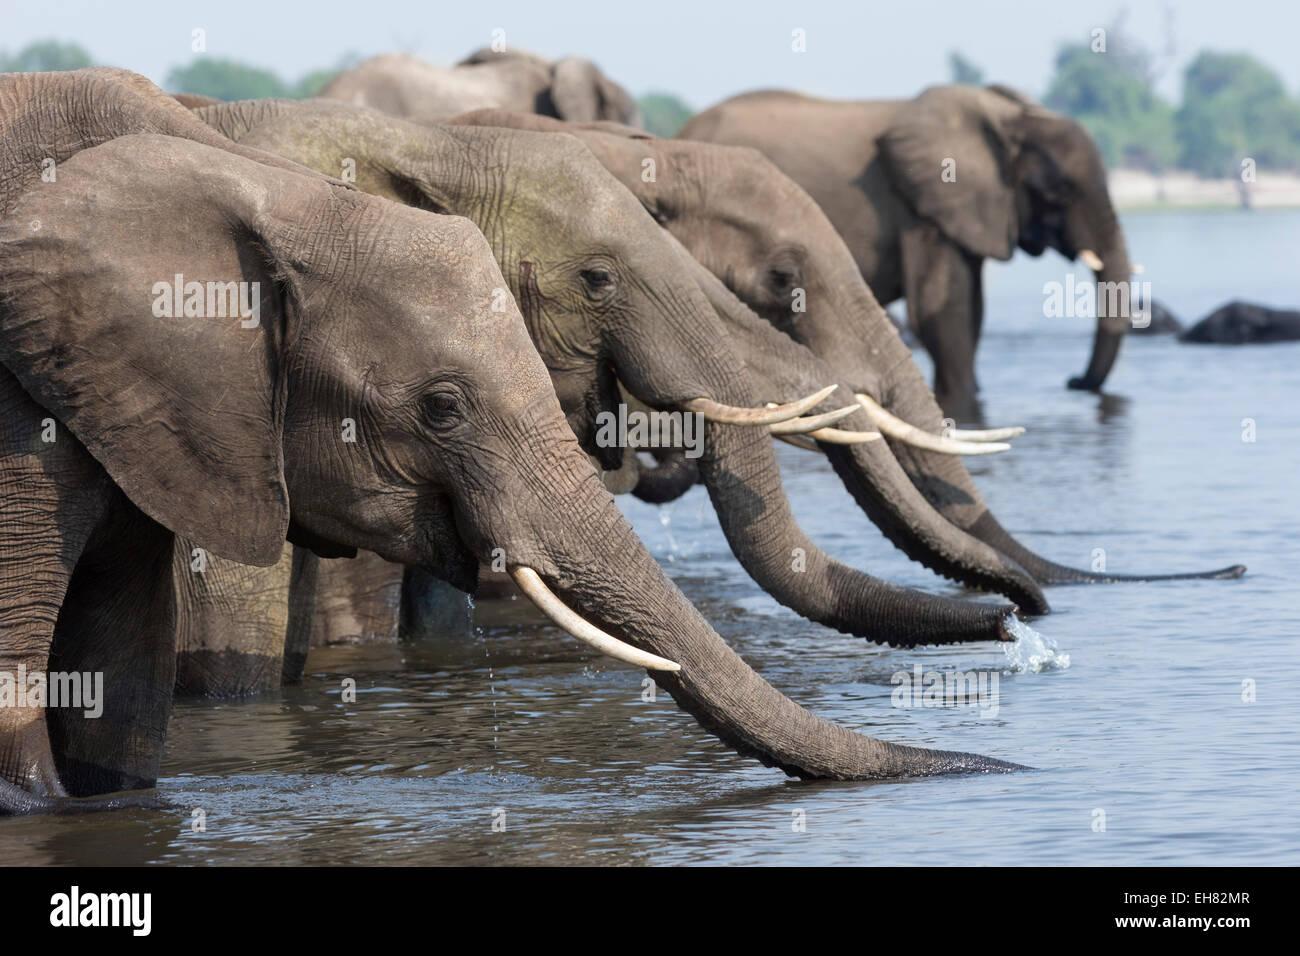 Les éléphants d'Afrique (Loxodonta africana) boire, Chobe National Park, Botswana, Africa Photo Stock